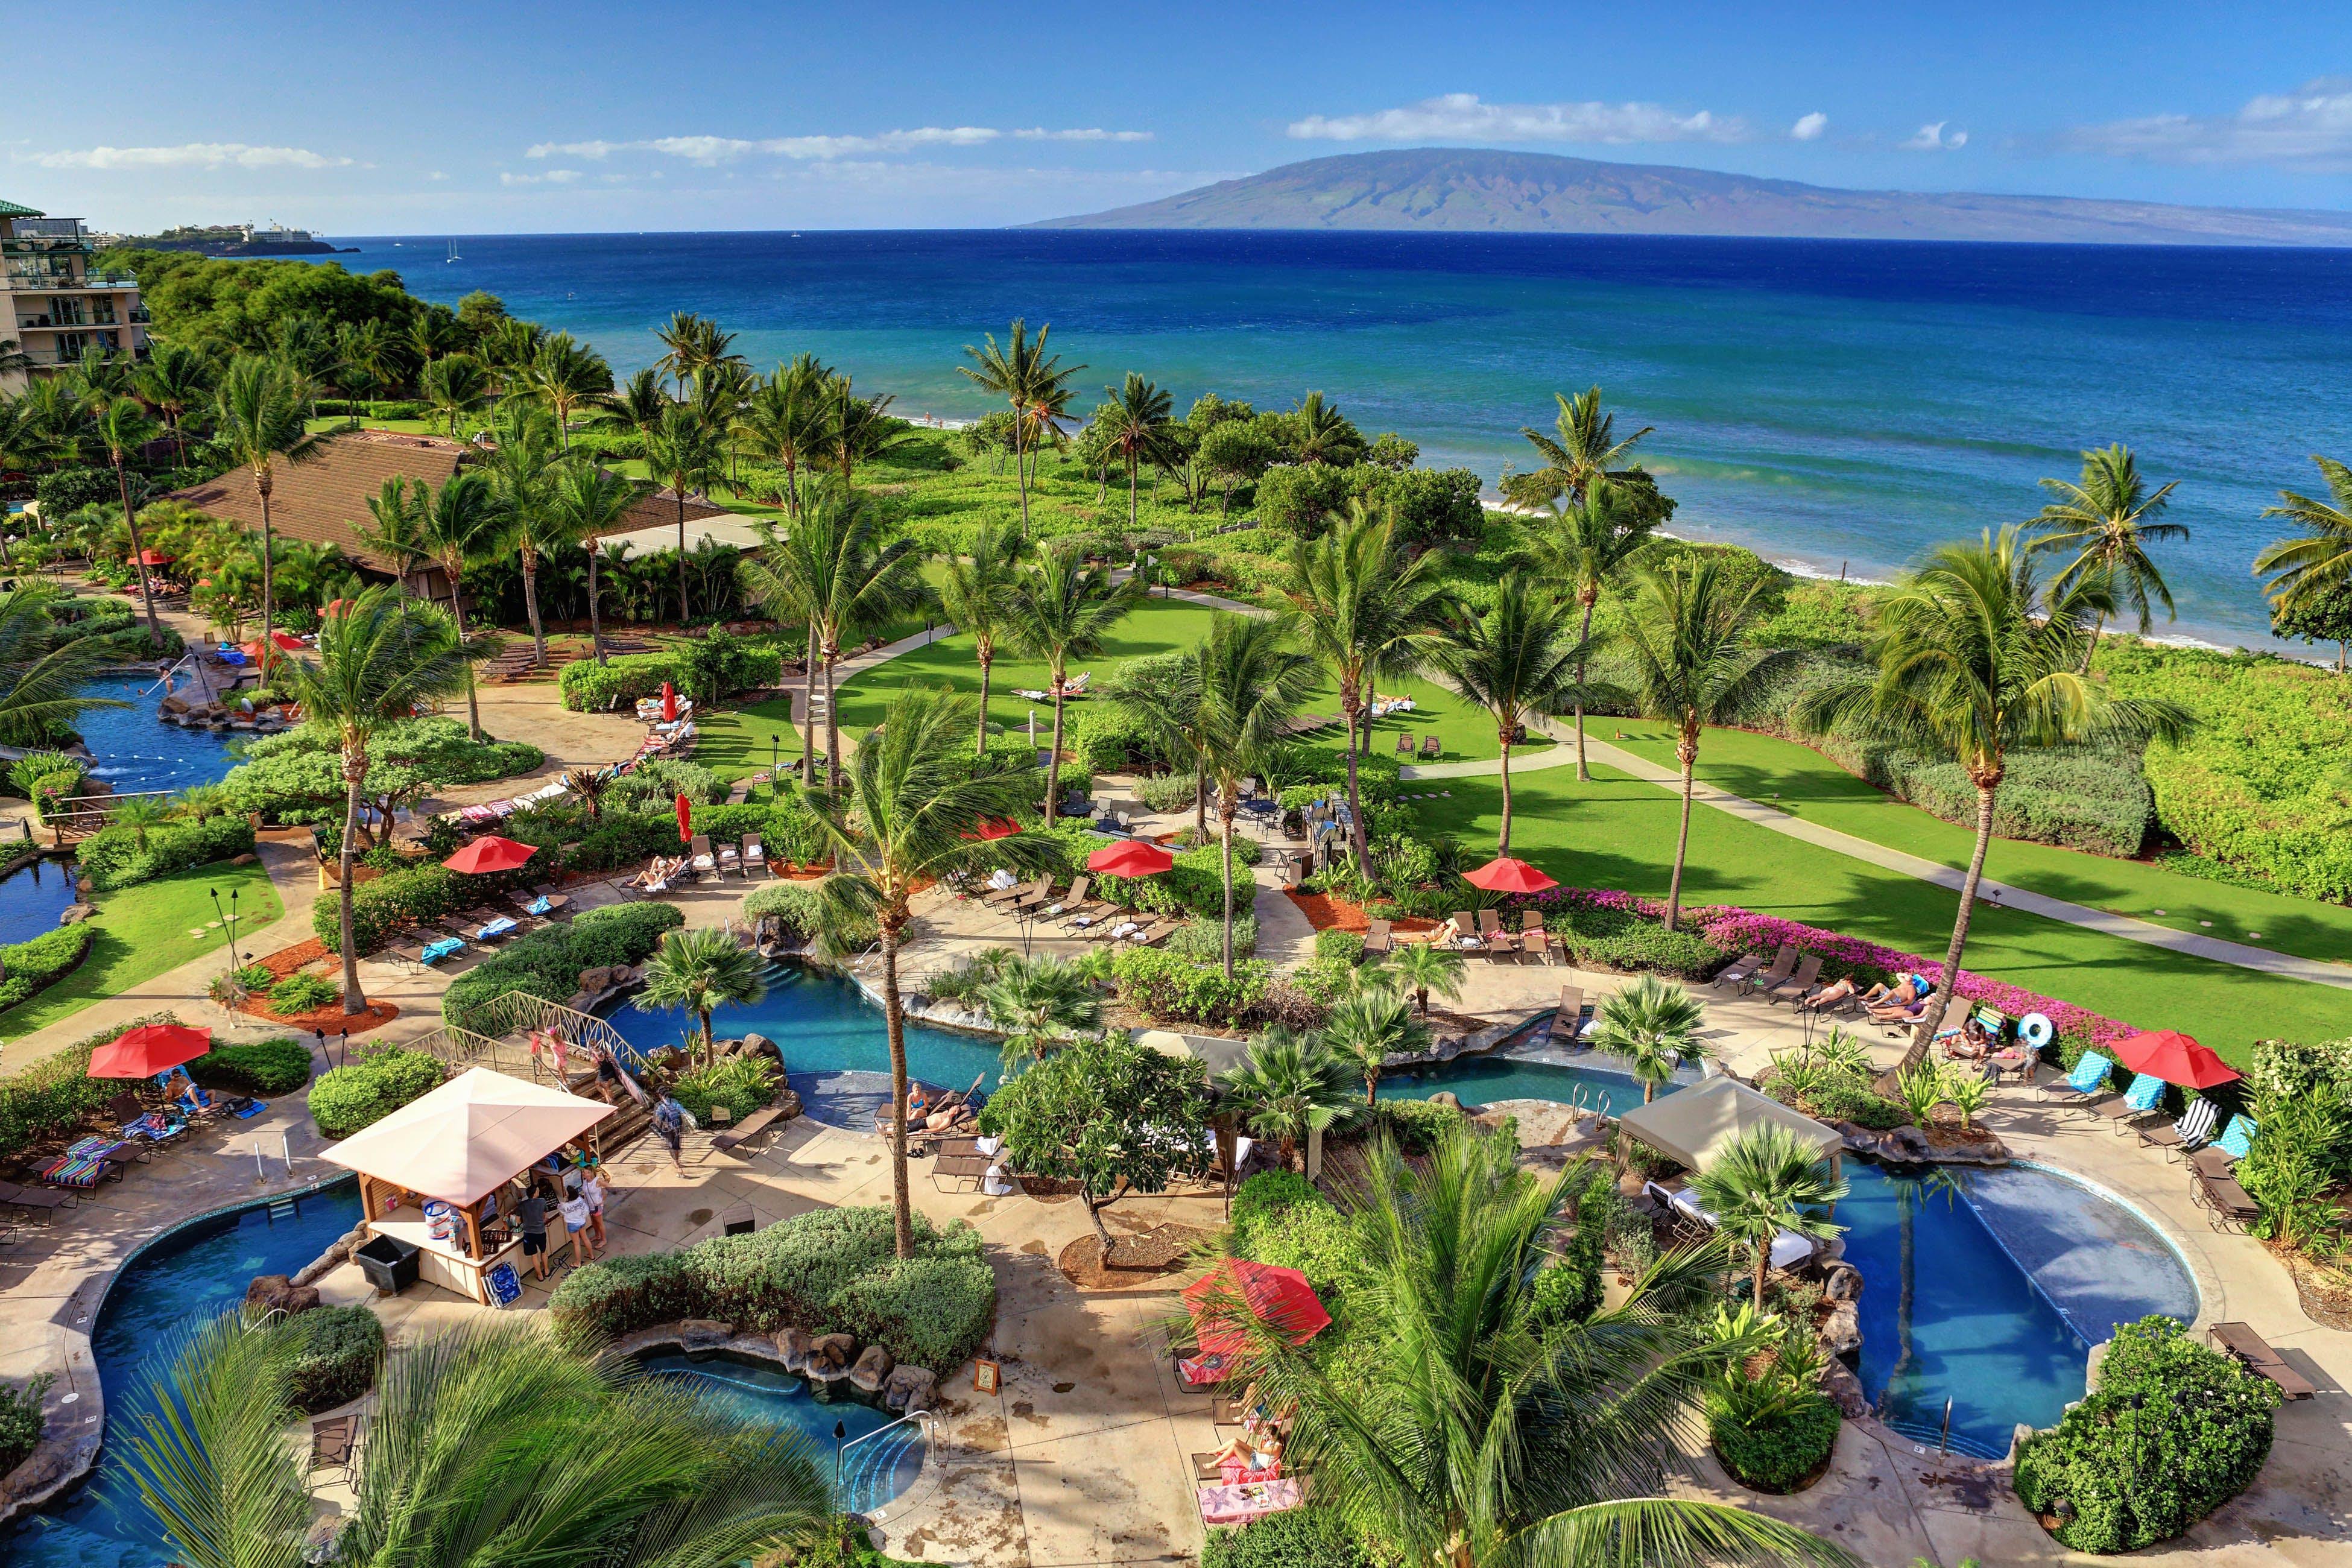 Maui oceanfront resort